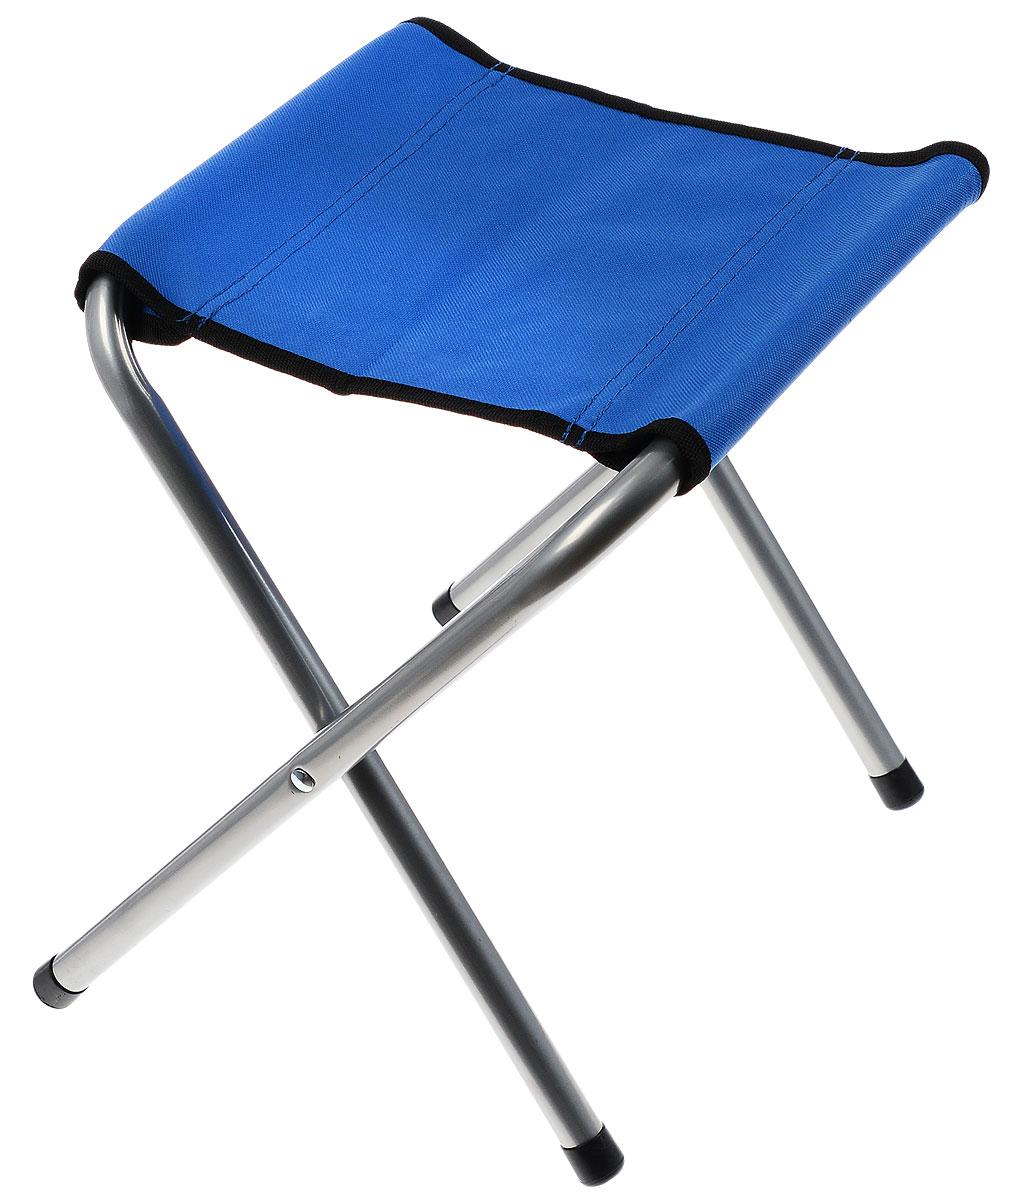 "Табурет складной ""Irit Home"", цвет: стальной, синий, 28 х 33 х 35 см"